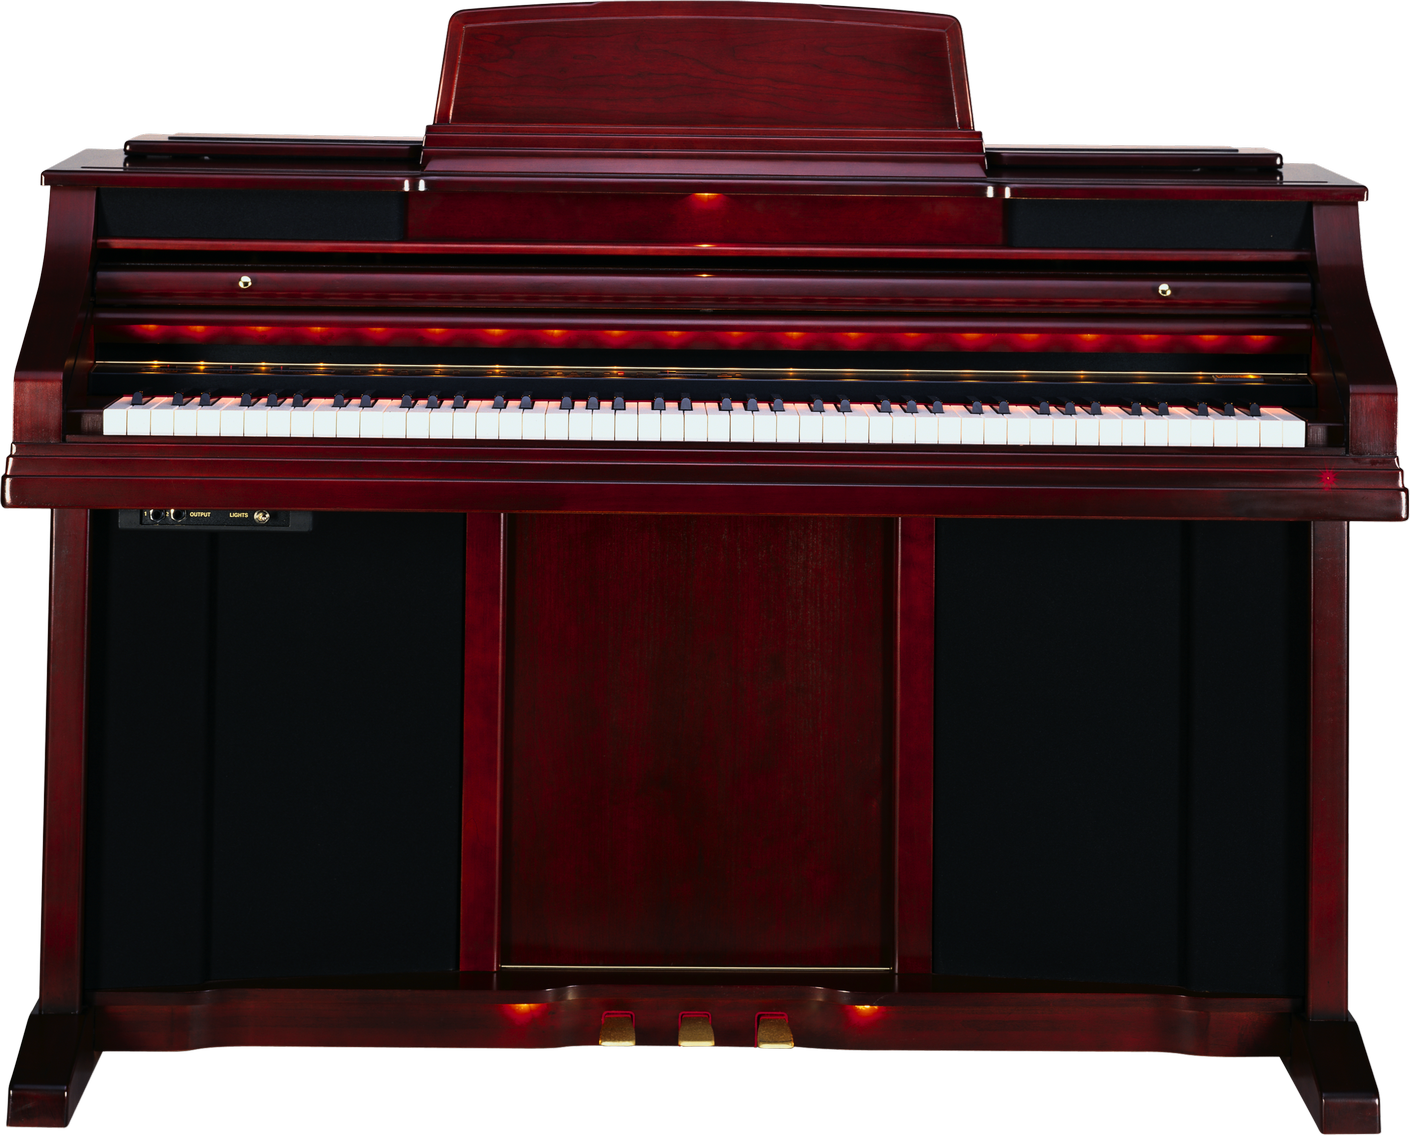 Piano Png Image Piano Grand Piano Grands